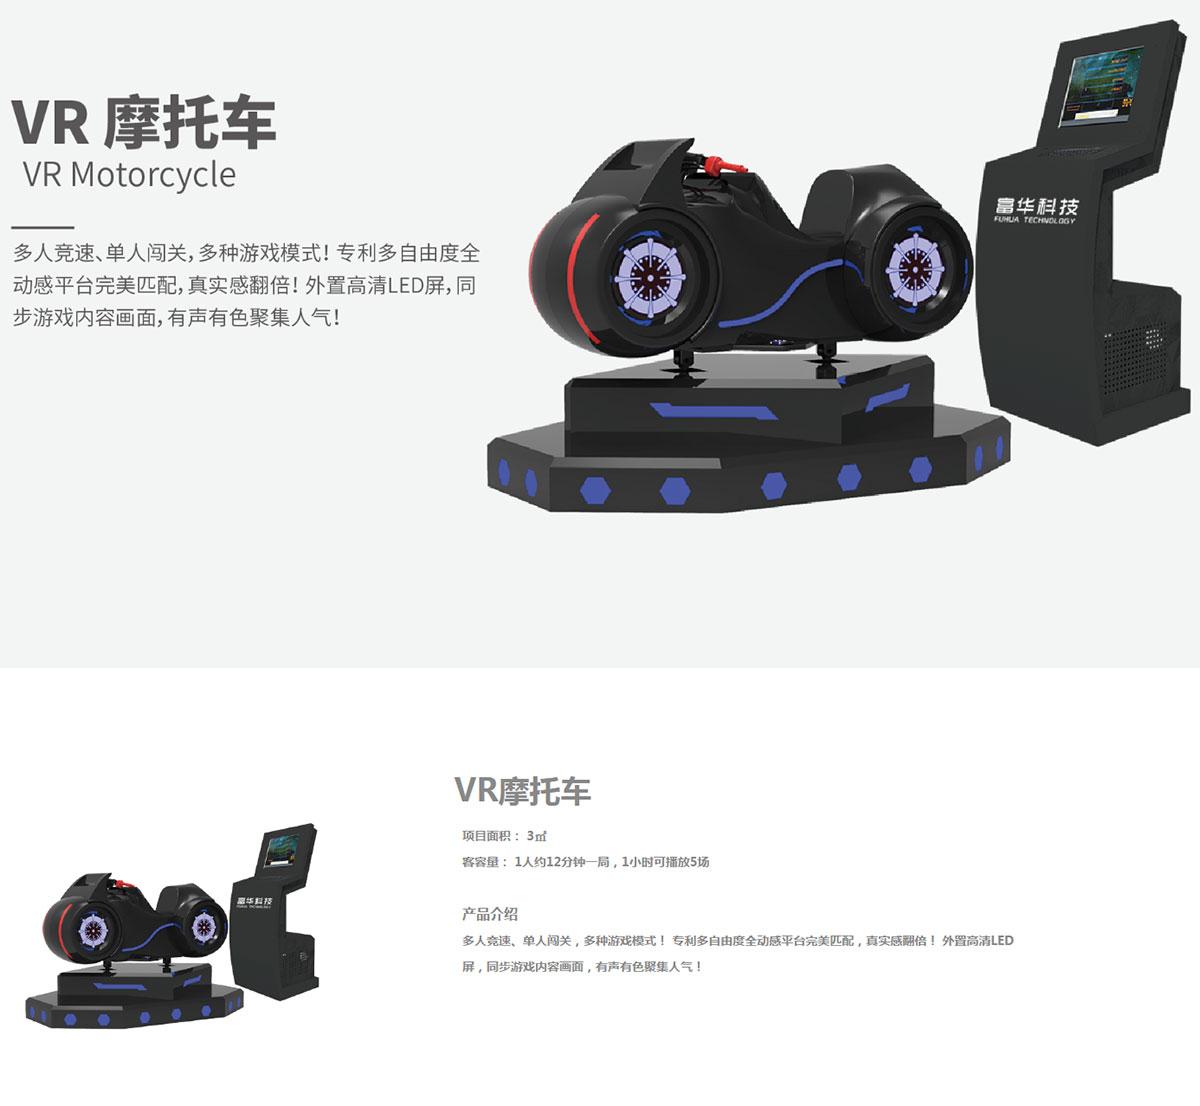 VR摩托车插图